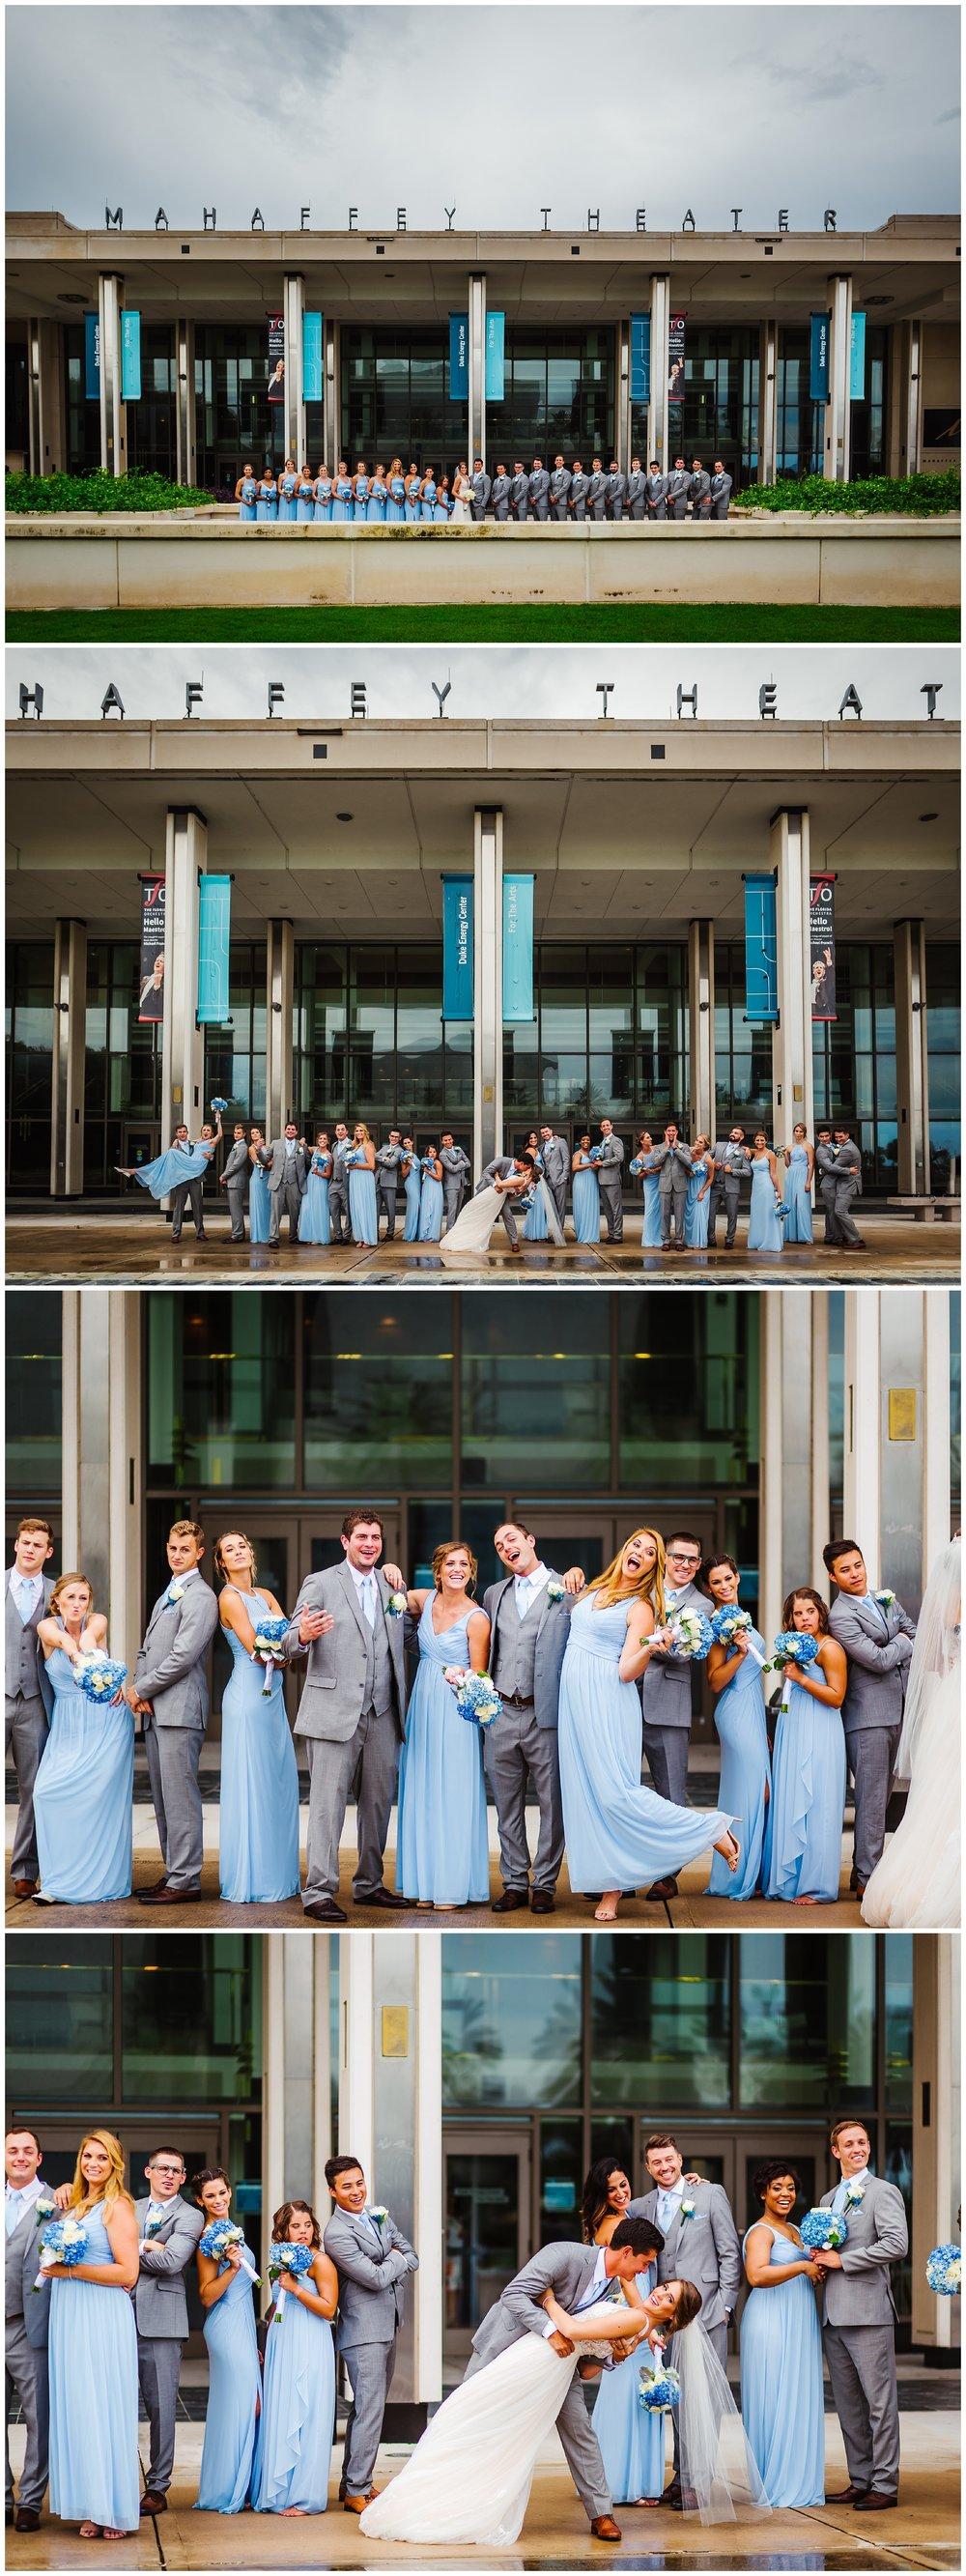 mahaffey-theater-big-military-wedding-st-pete-photographer-blue_0060.jpg